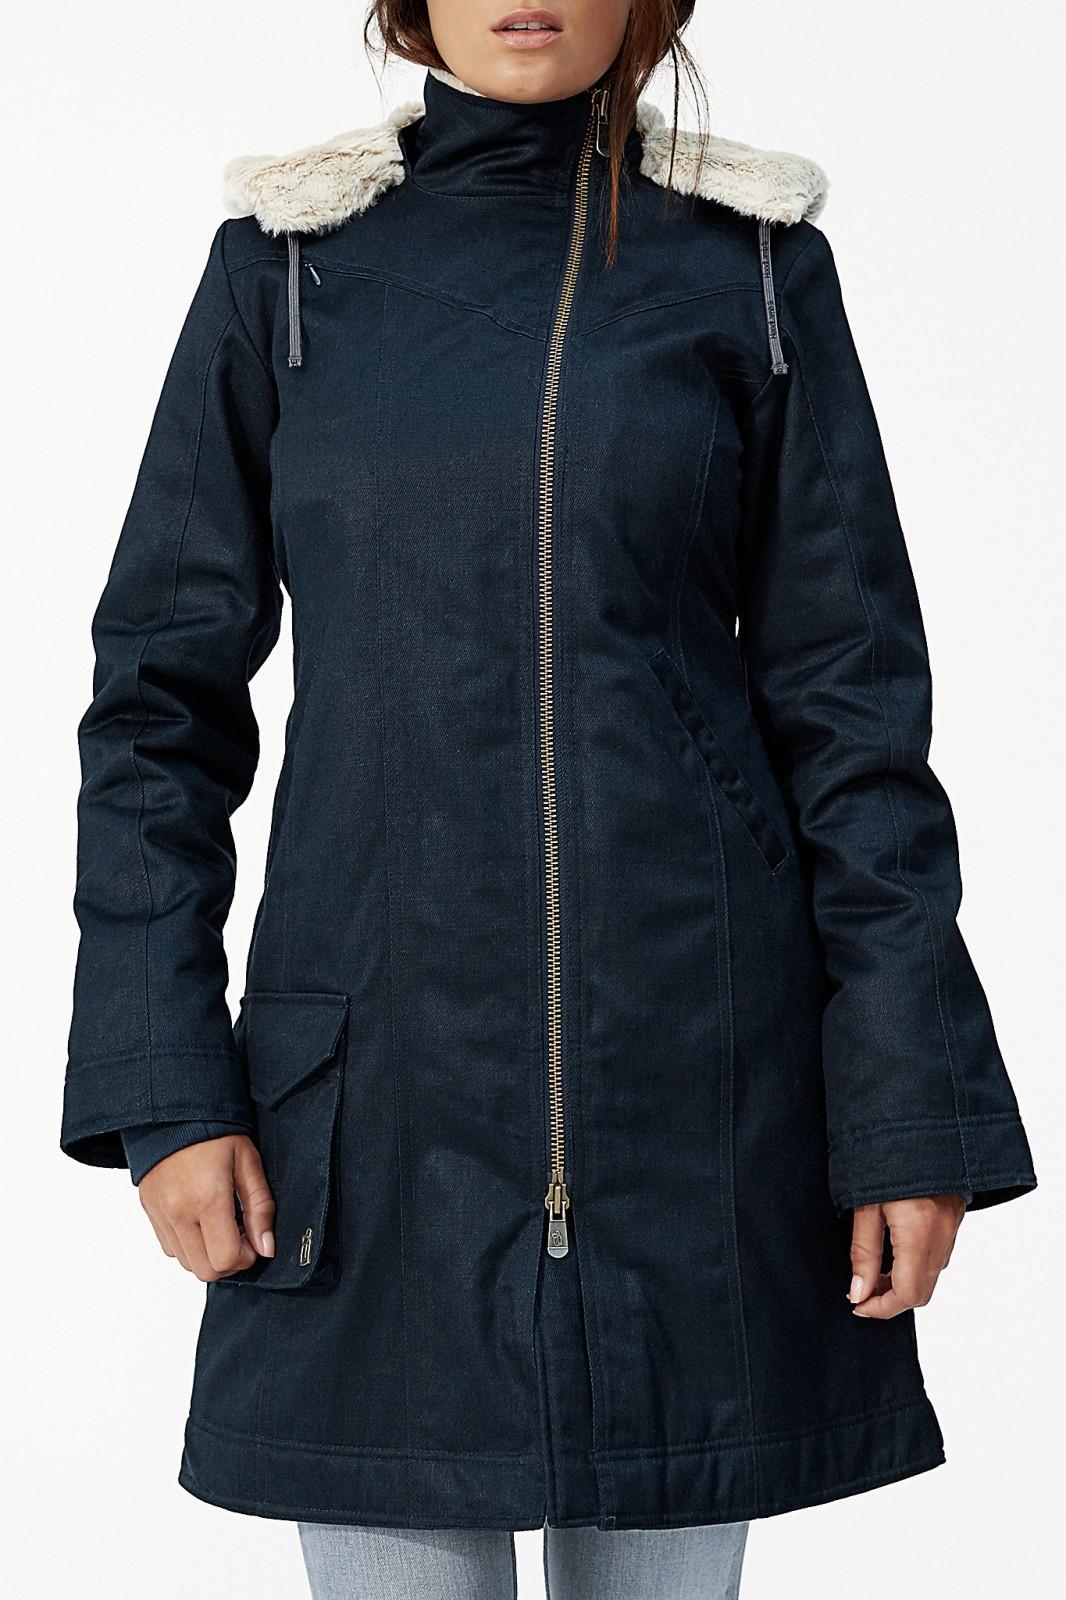 Hoodlamb Ladies' Long HoodLamb Coat